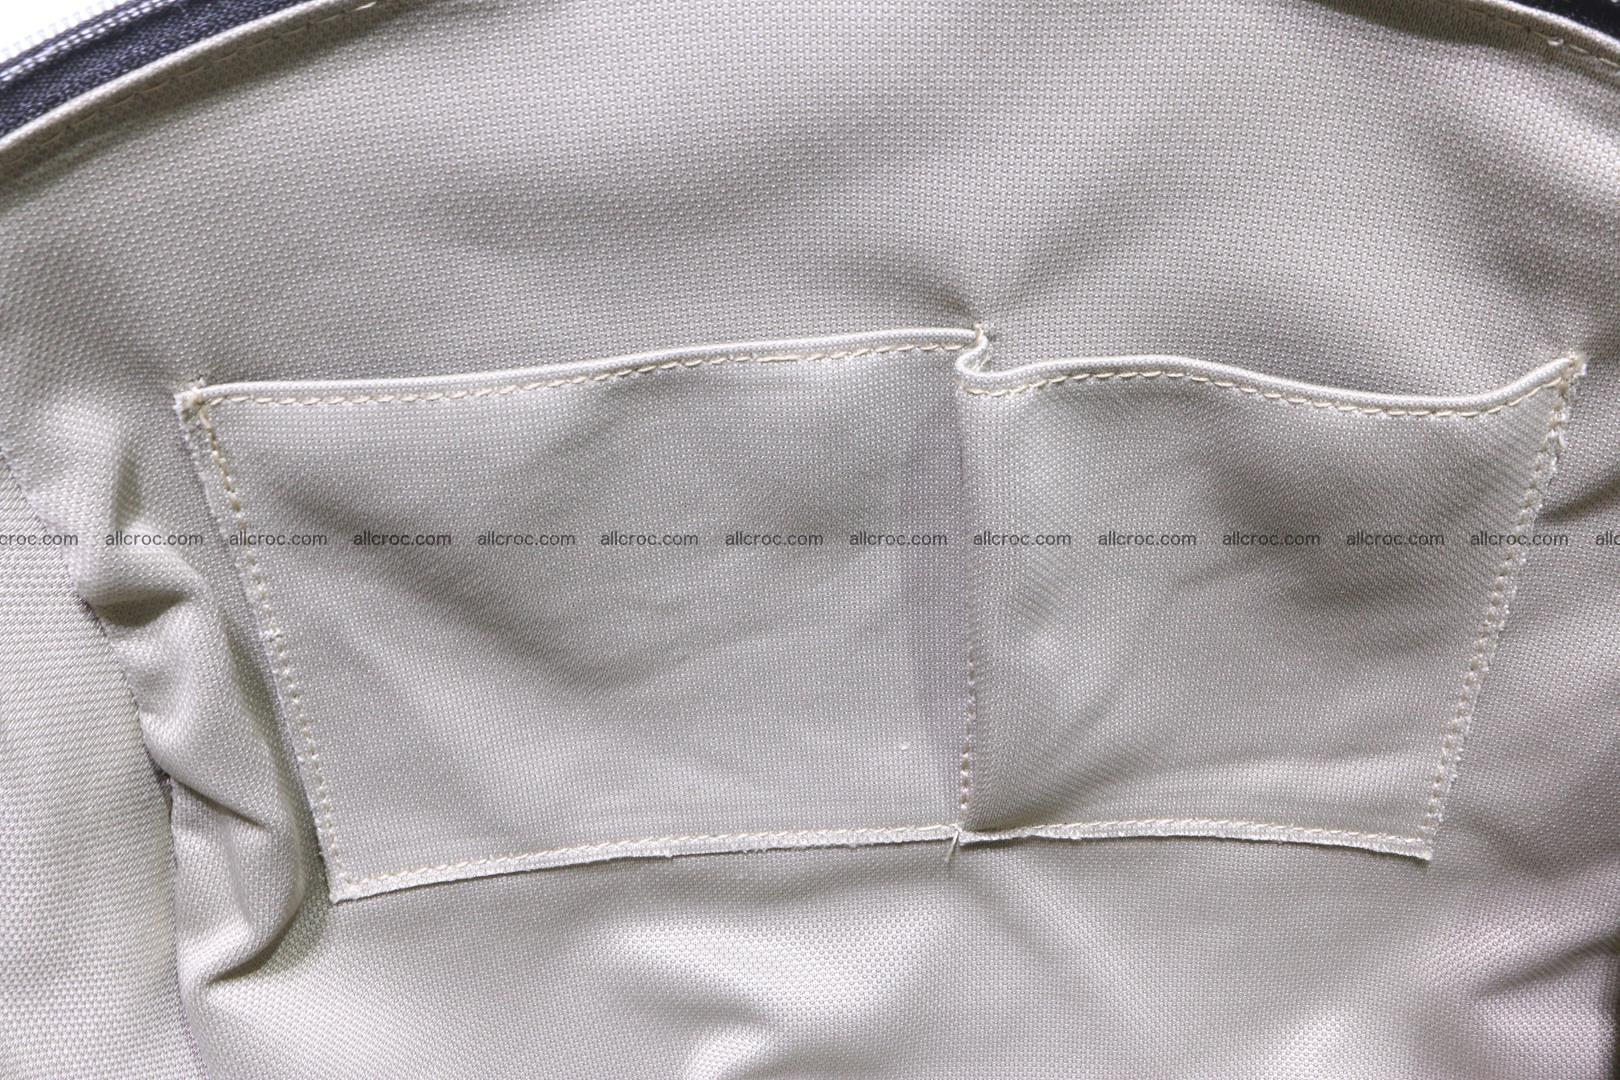 Python handbag for women from genuine python skin 219 Foto 11